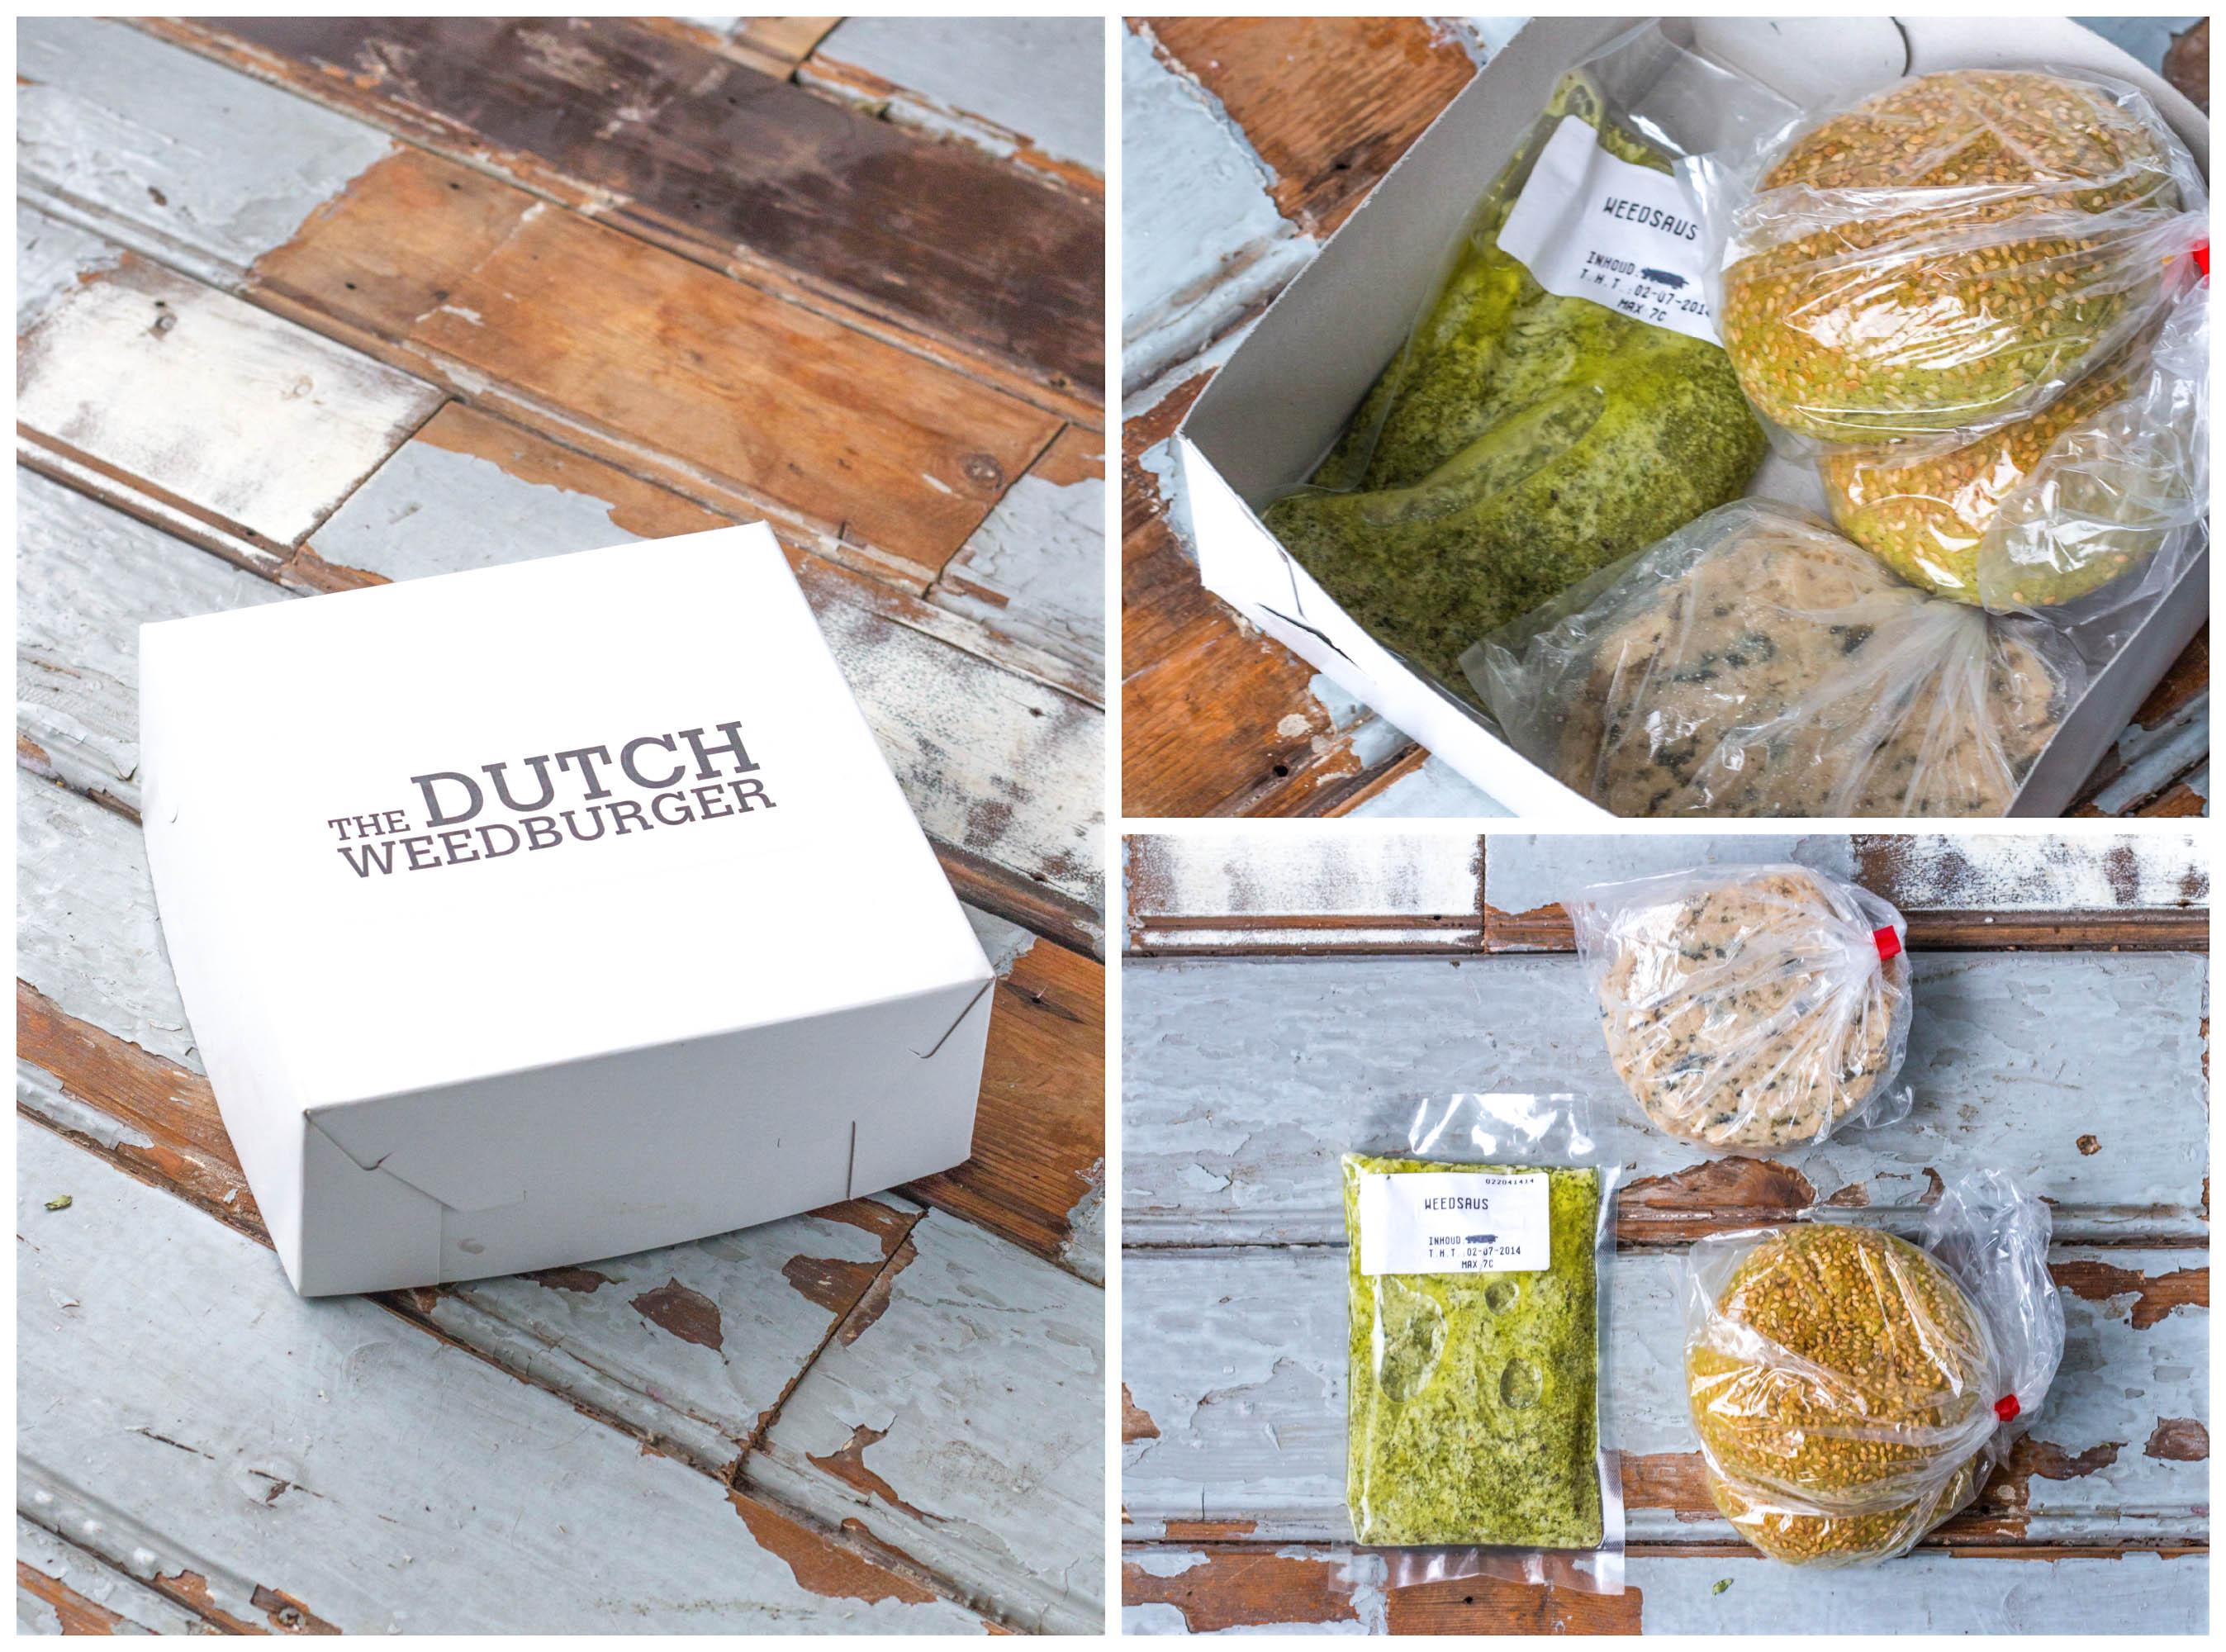 The Dutch Weed Burger DIY Kit